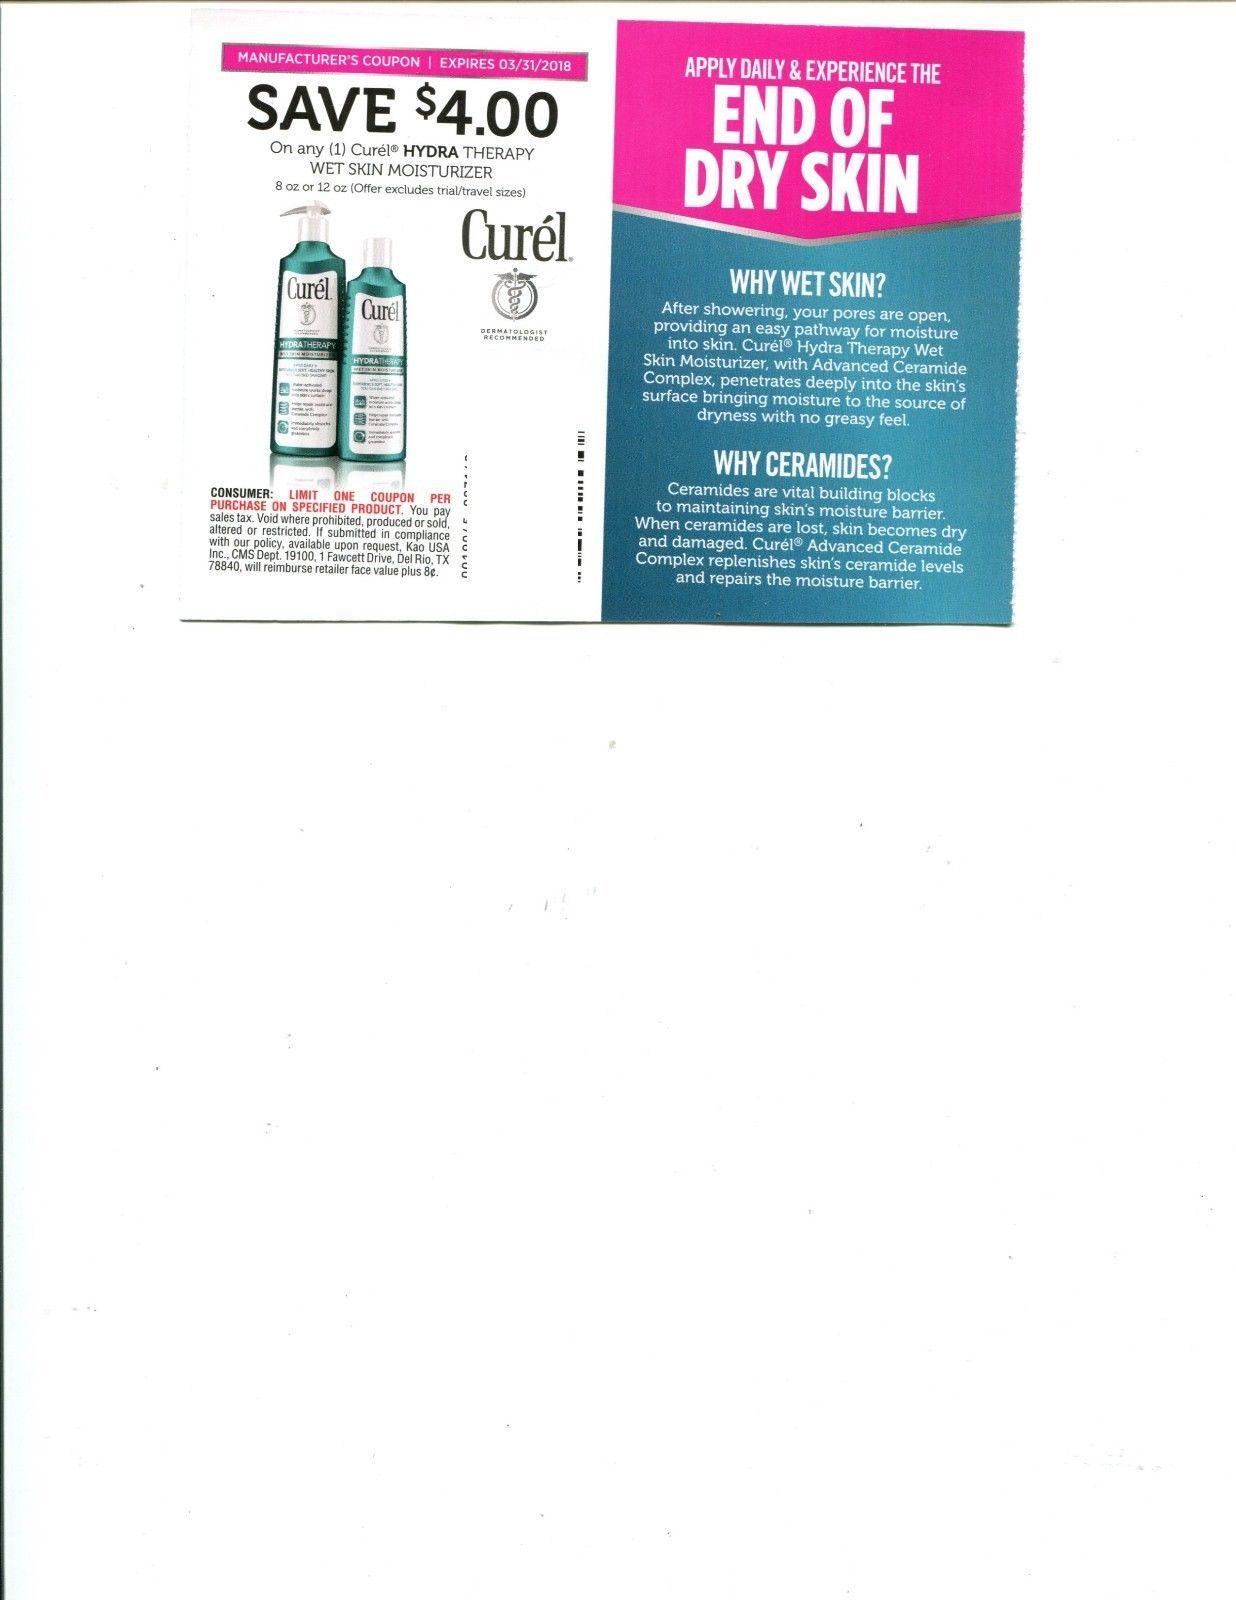 Curel hydra therapy wet skin moisturizer discount savings